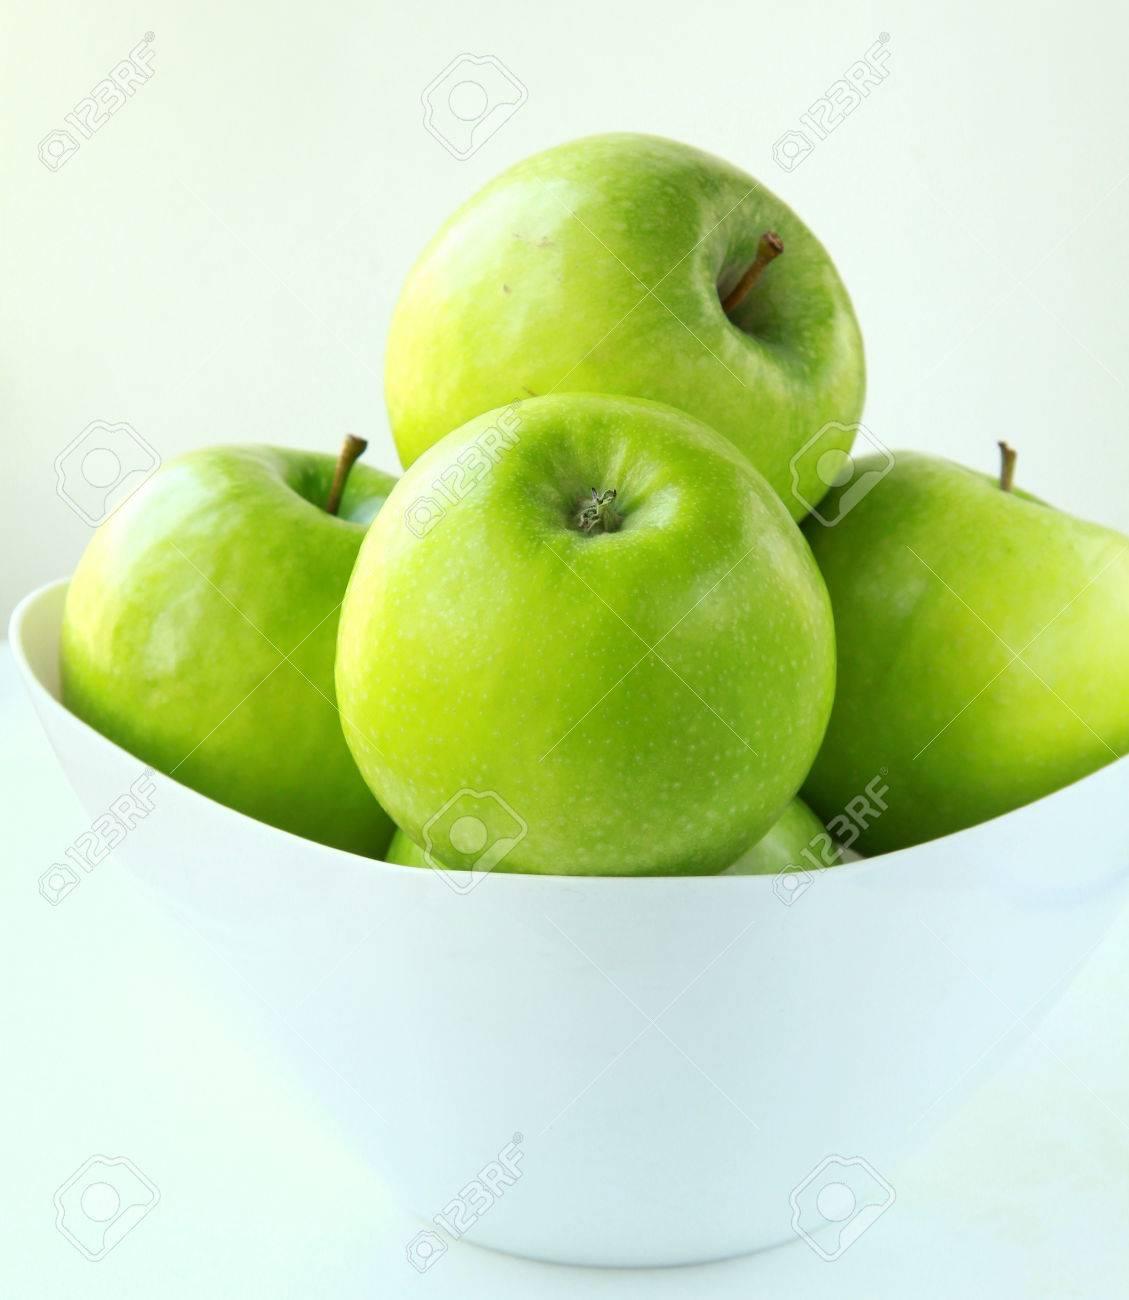 Stylish green Granny Smith apples Stock Photo - 9261962